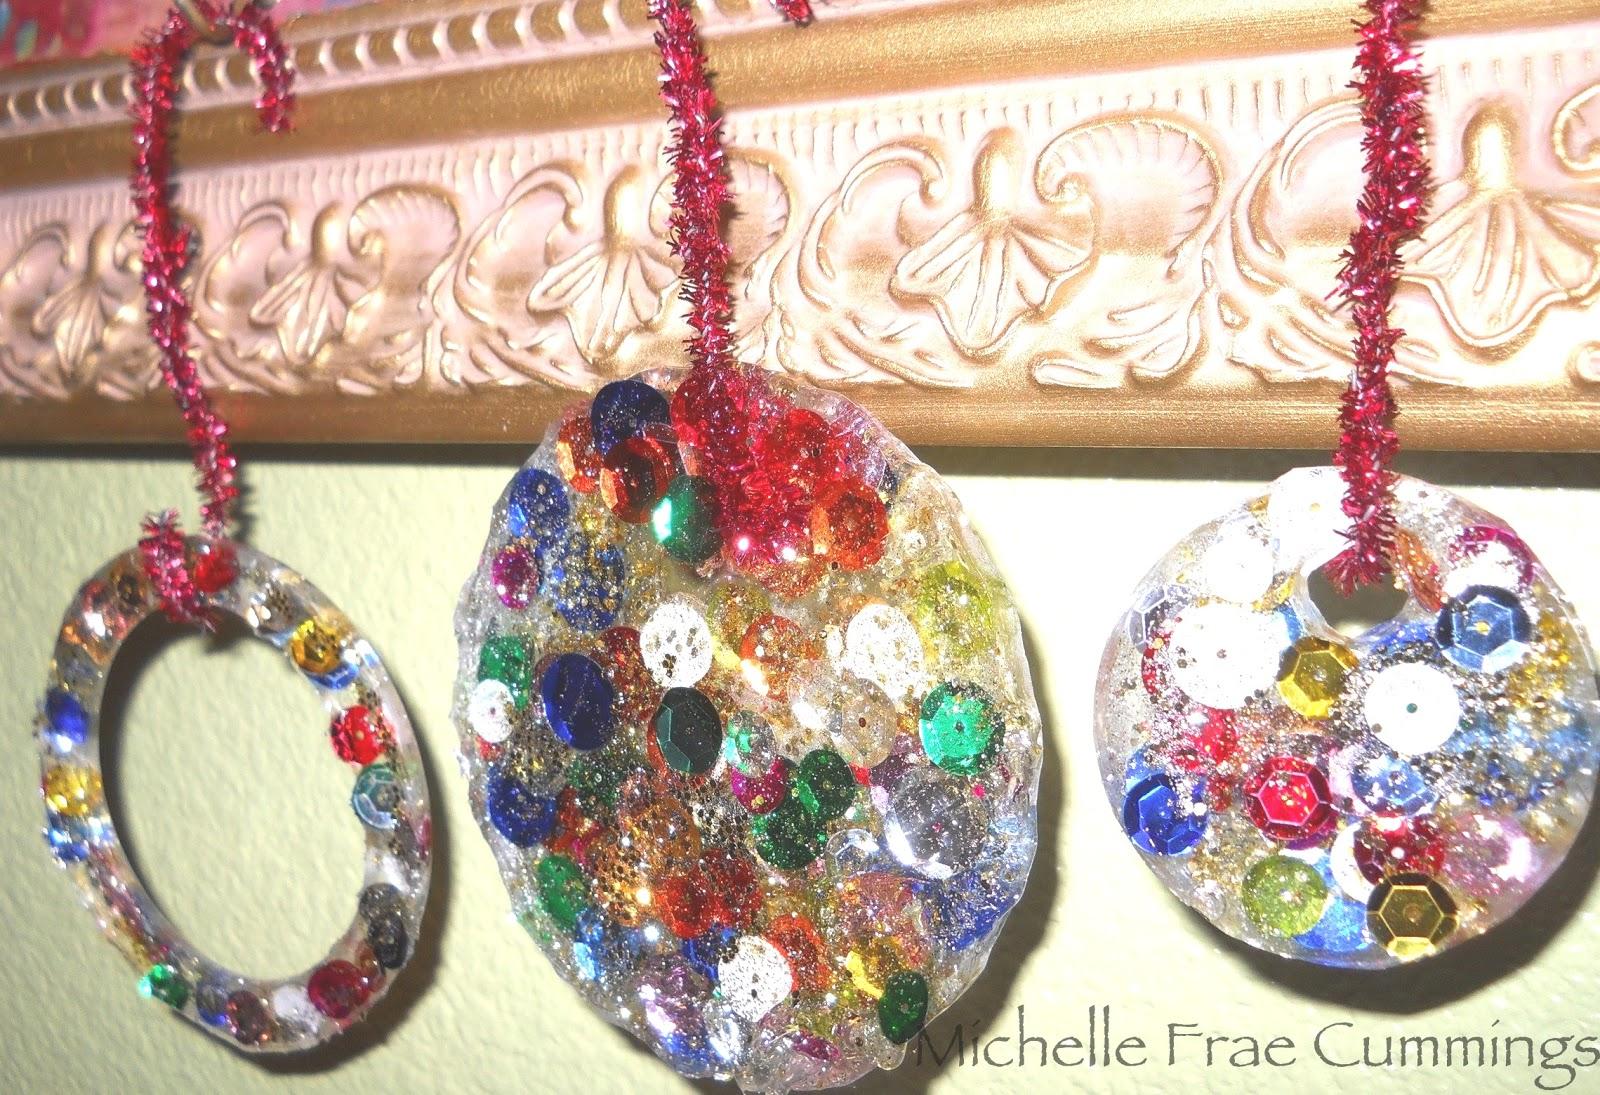 Resin Christmas Ornaments.Faerie Dust Dreams Resin Christmas Ornaments